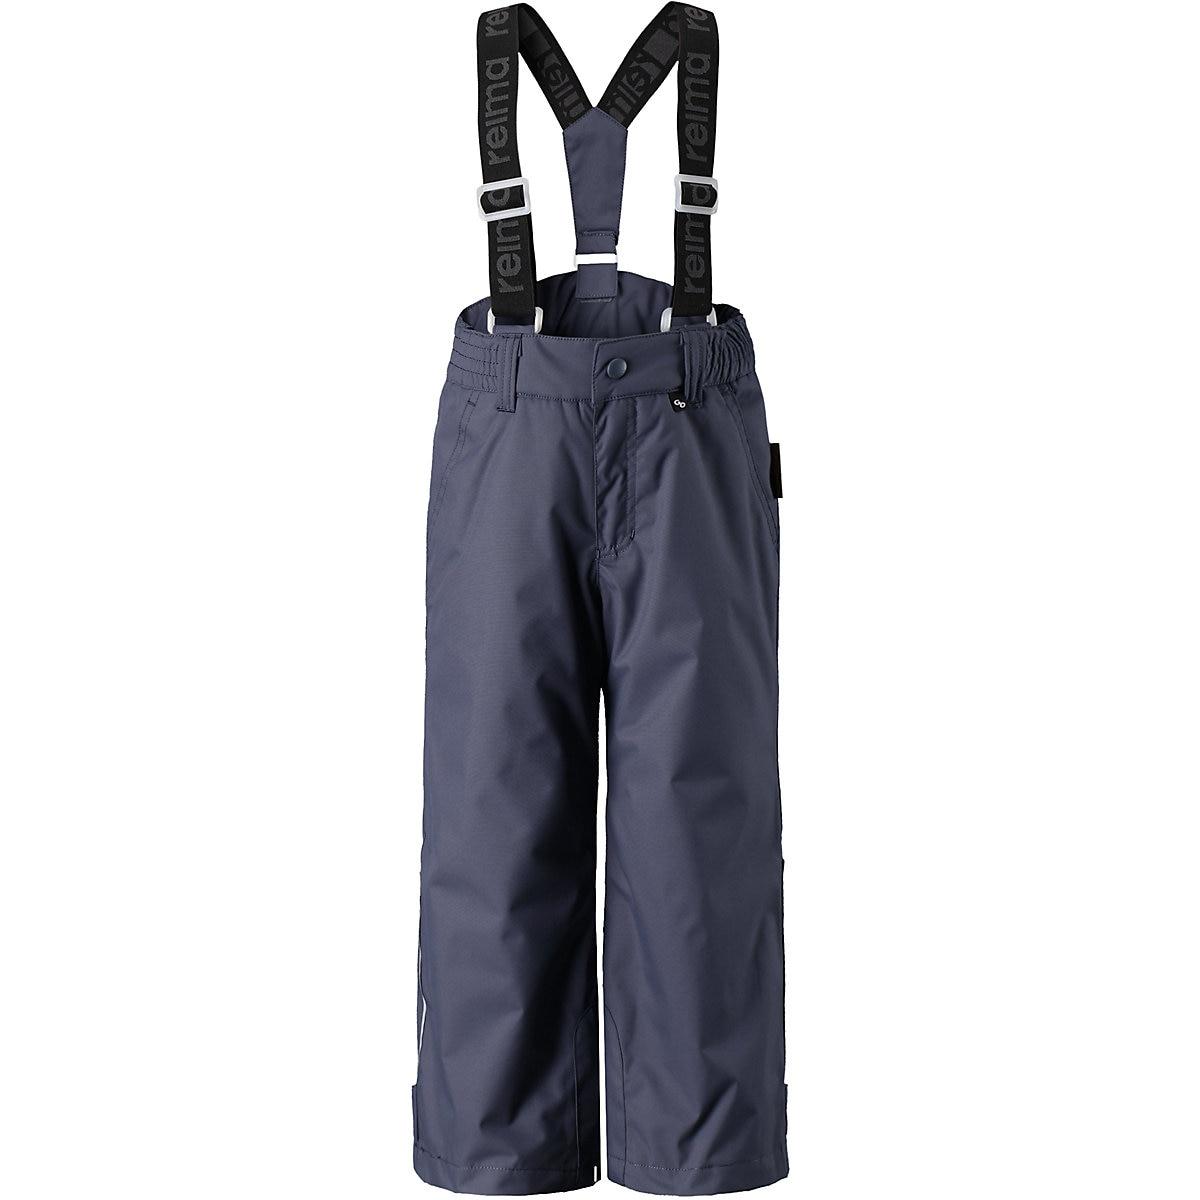 Pants & Capris Reima 8689367 for boys and girls polyester autumn winter bomhcs cute women autumn winter 100